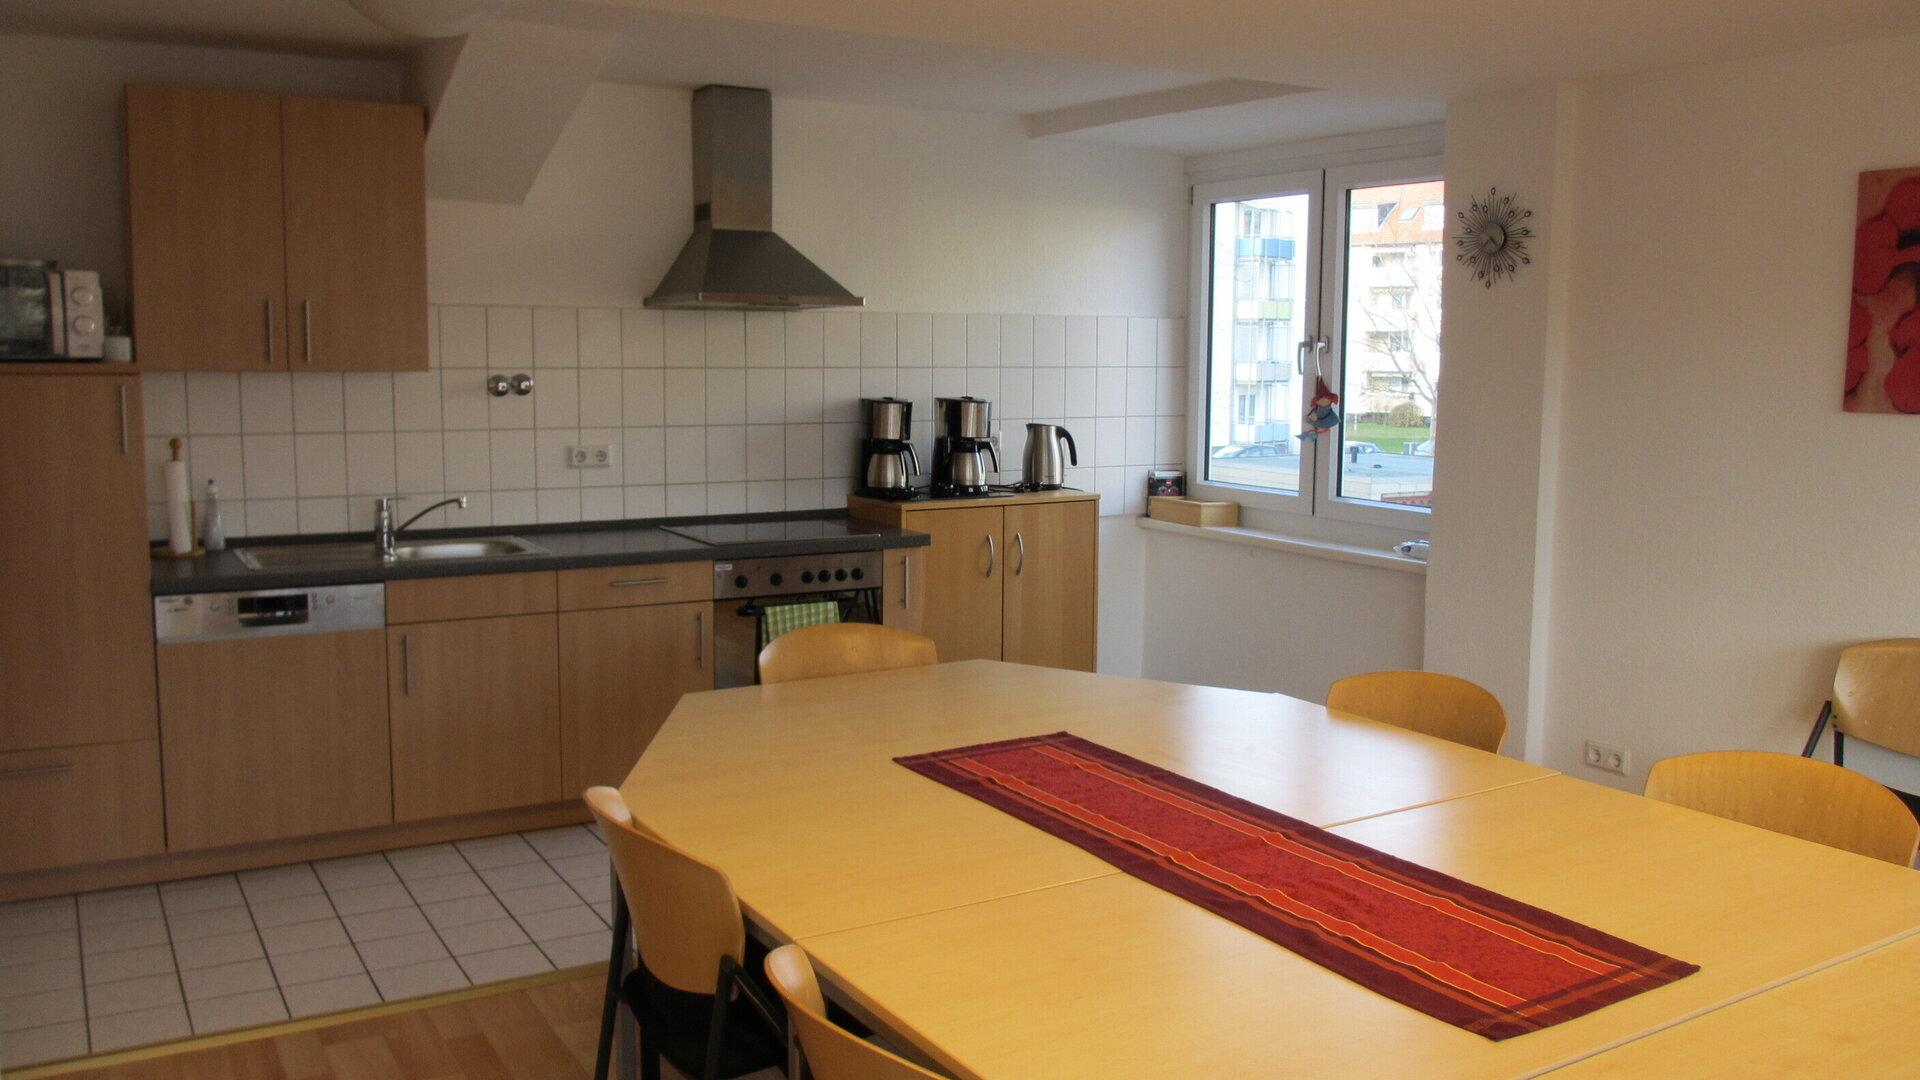 Lebens Raum Küche